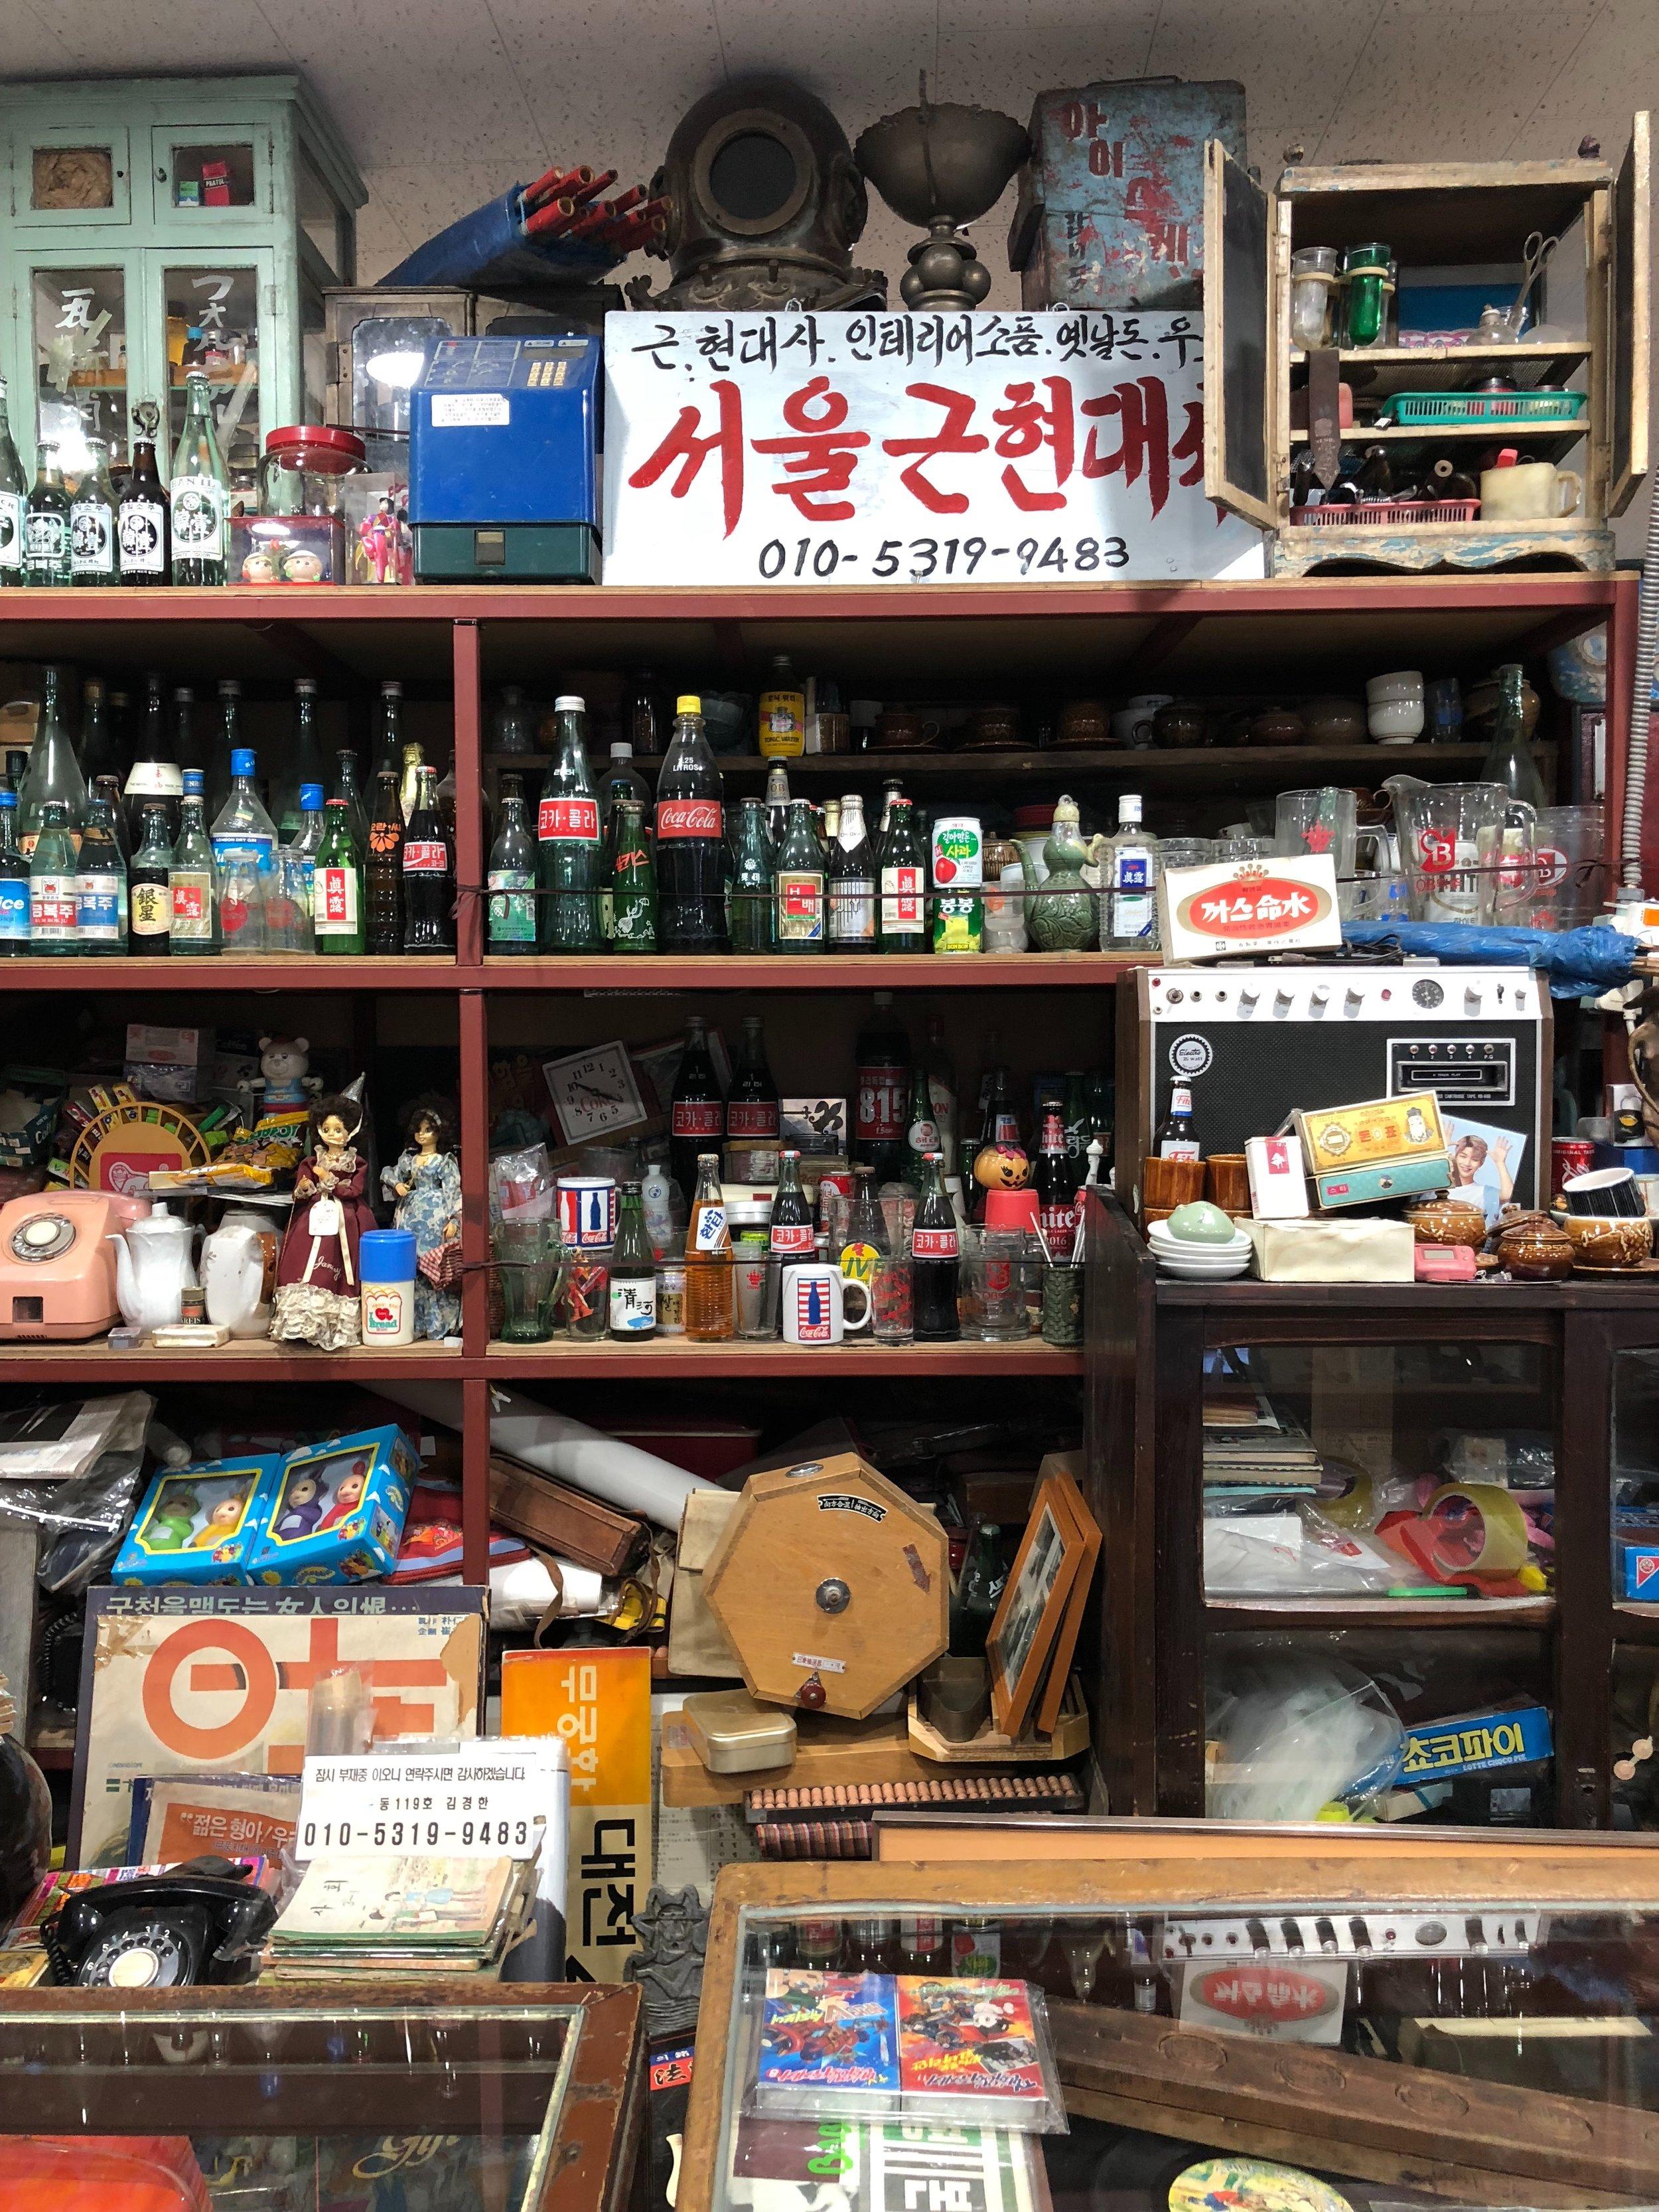 BDB in Seoul #bdbnytravels